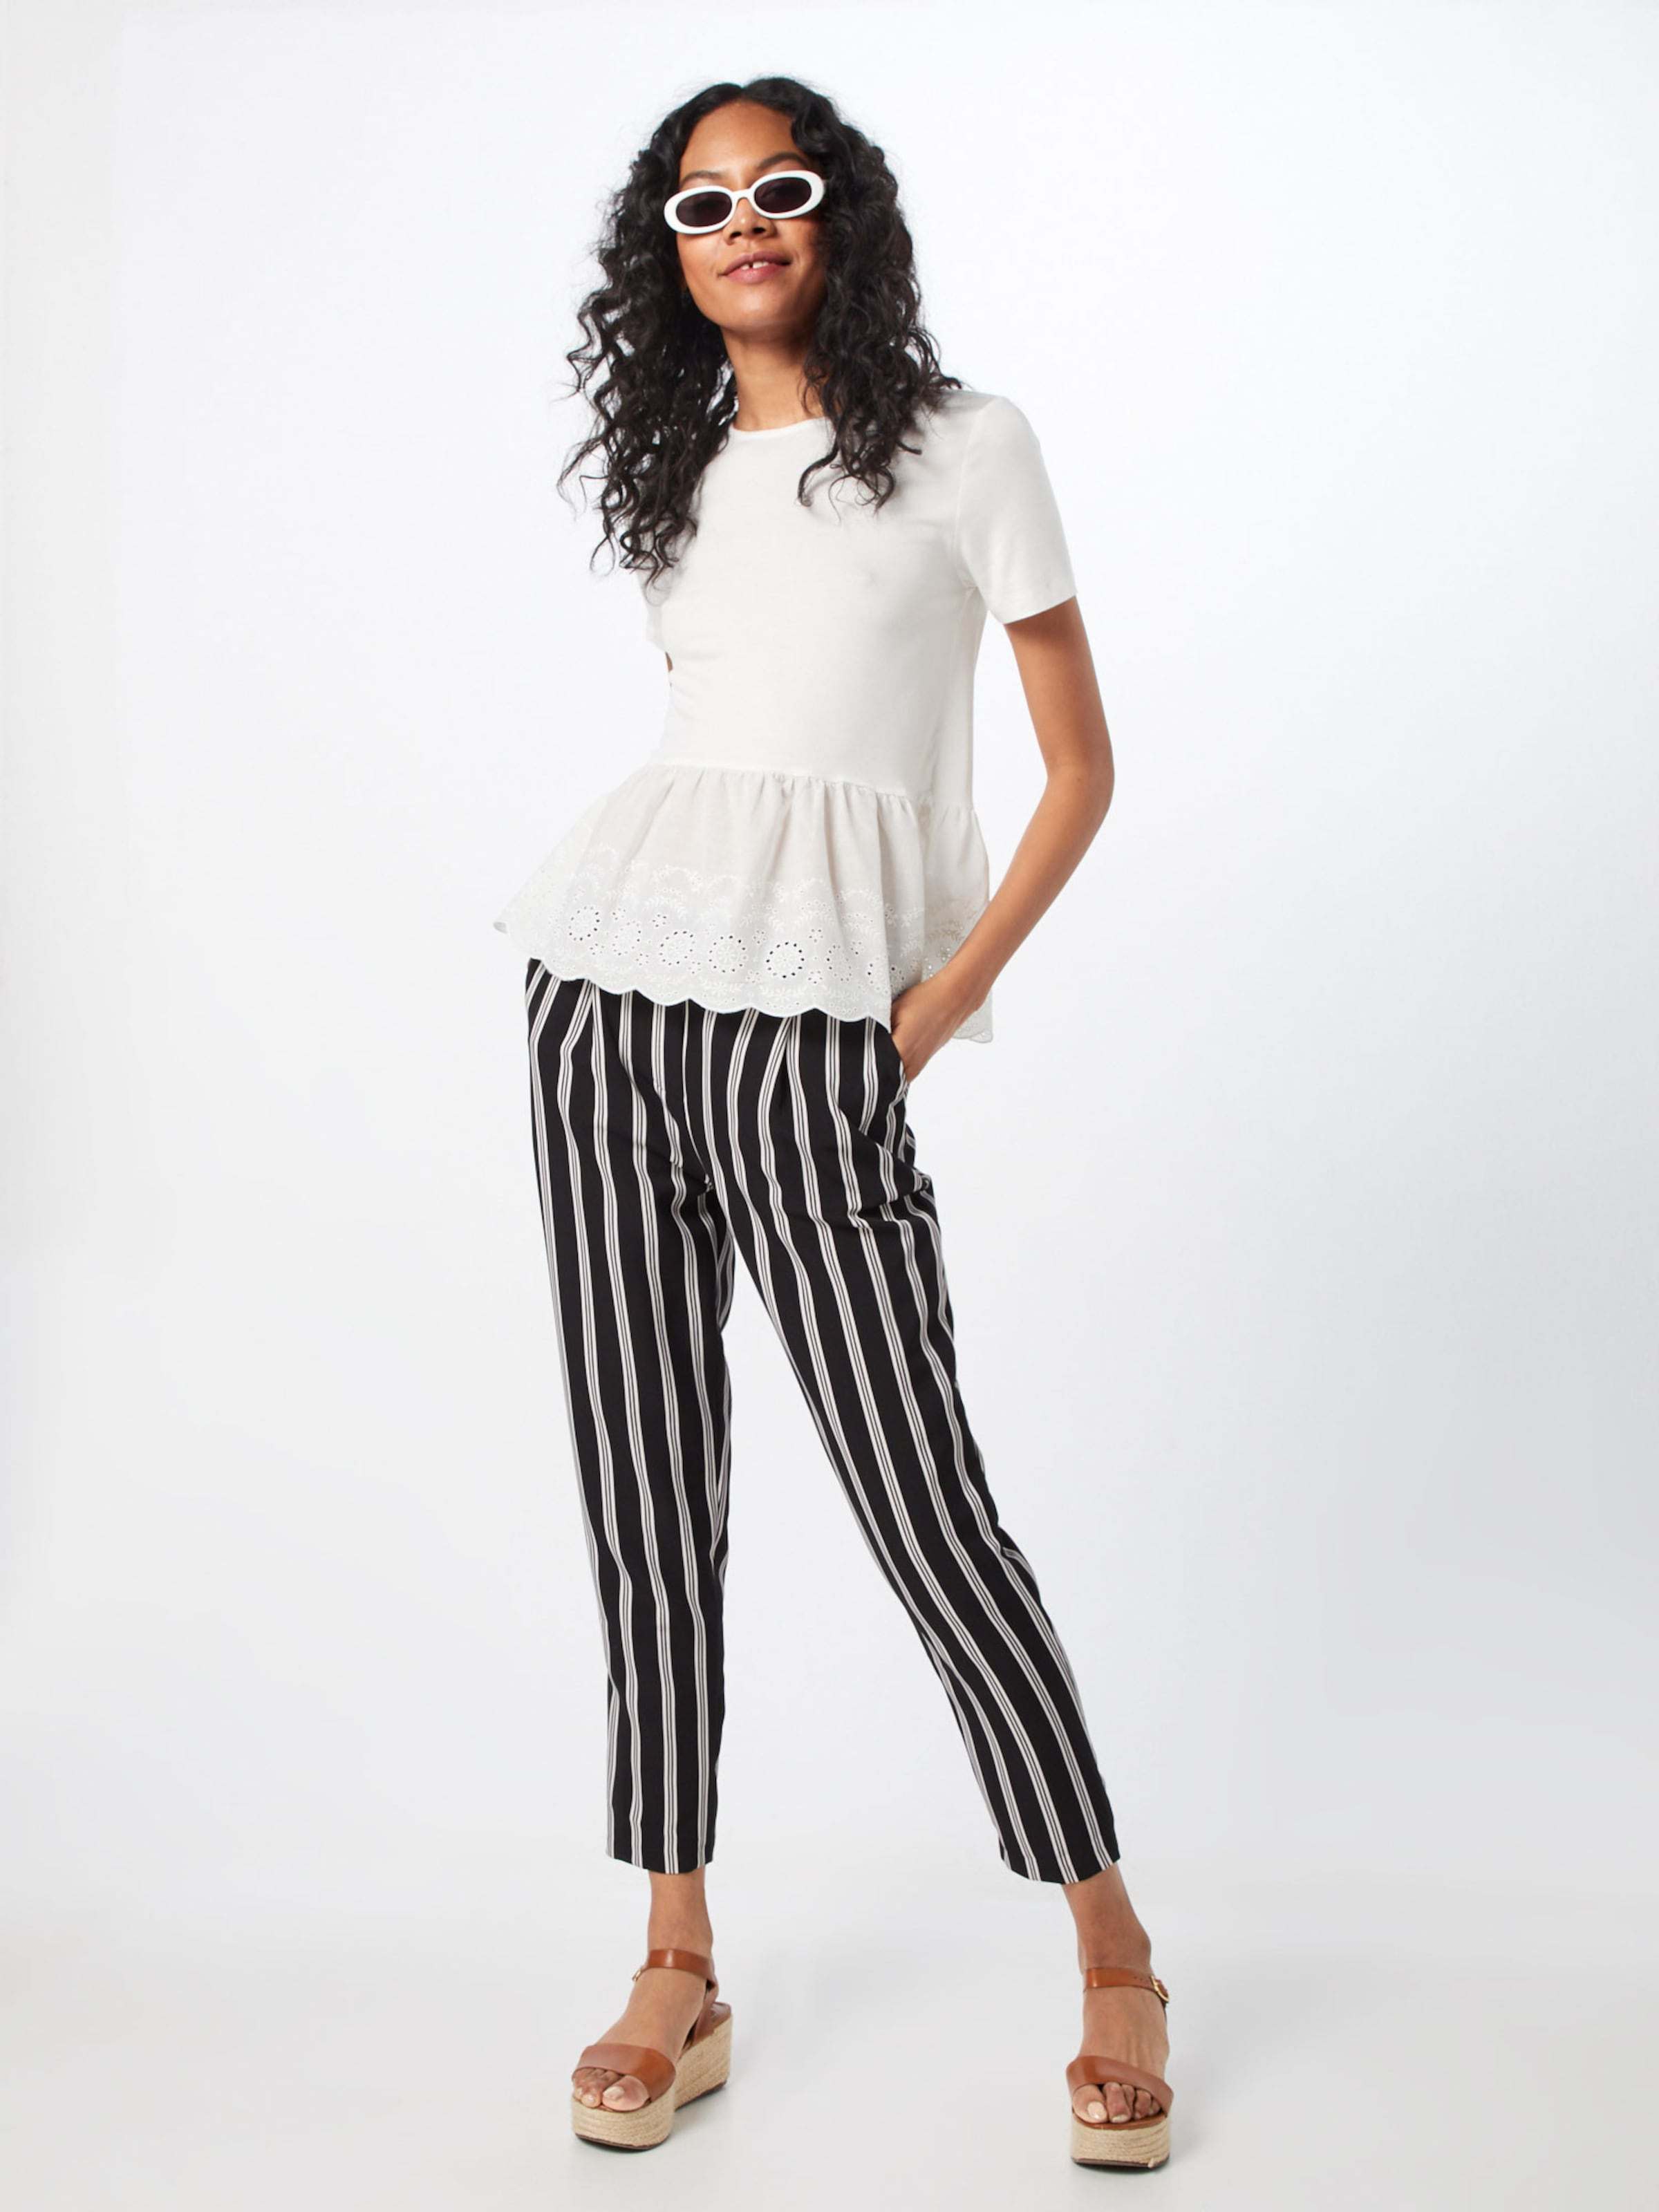 Shirt 've Broderie Peplum In New Mix Look Top' Weiß f67gyb